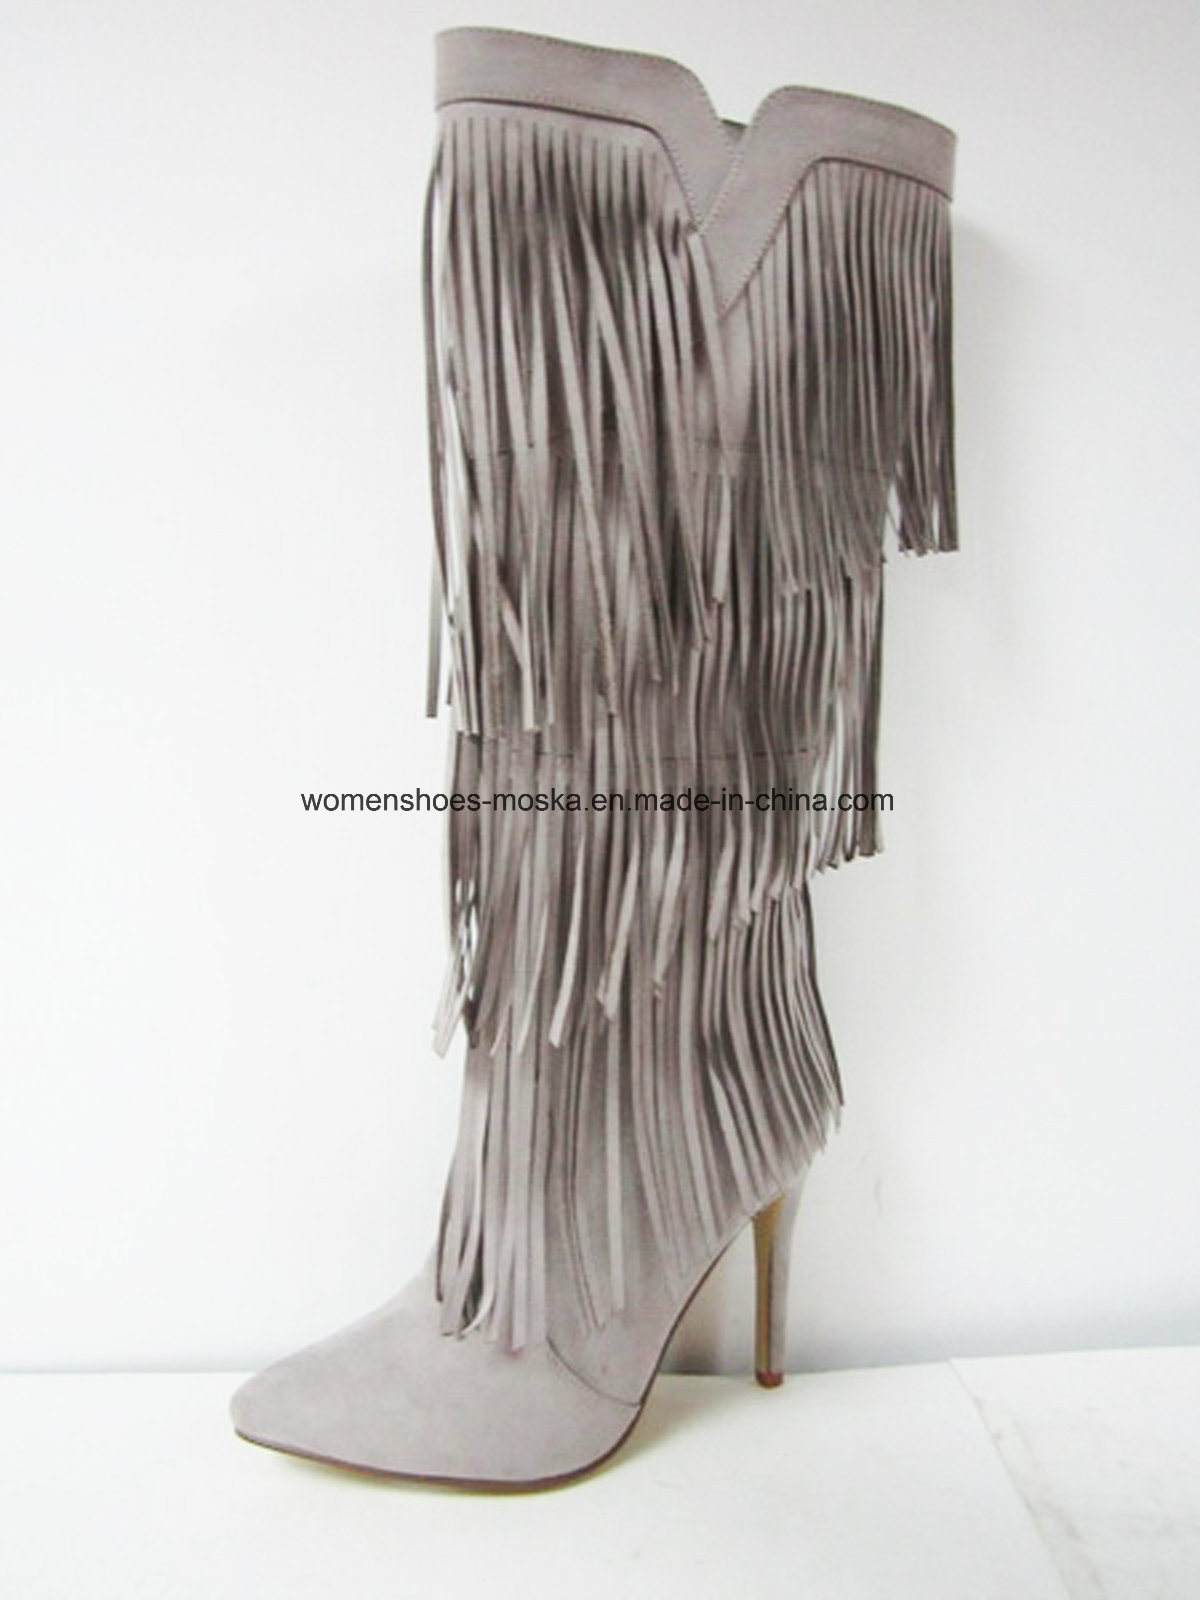 Lady Fashion High Heel Overknee Boots for Footwear